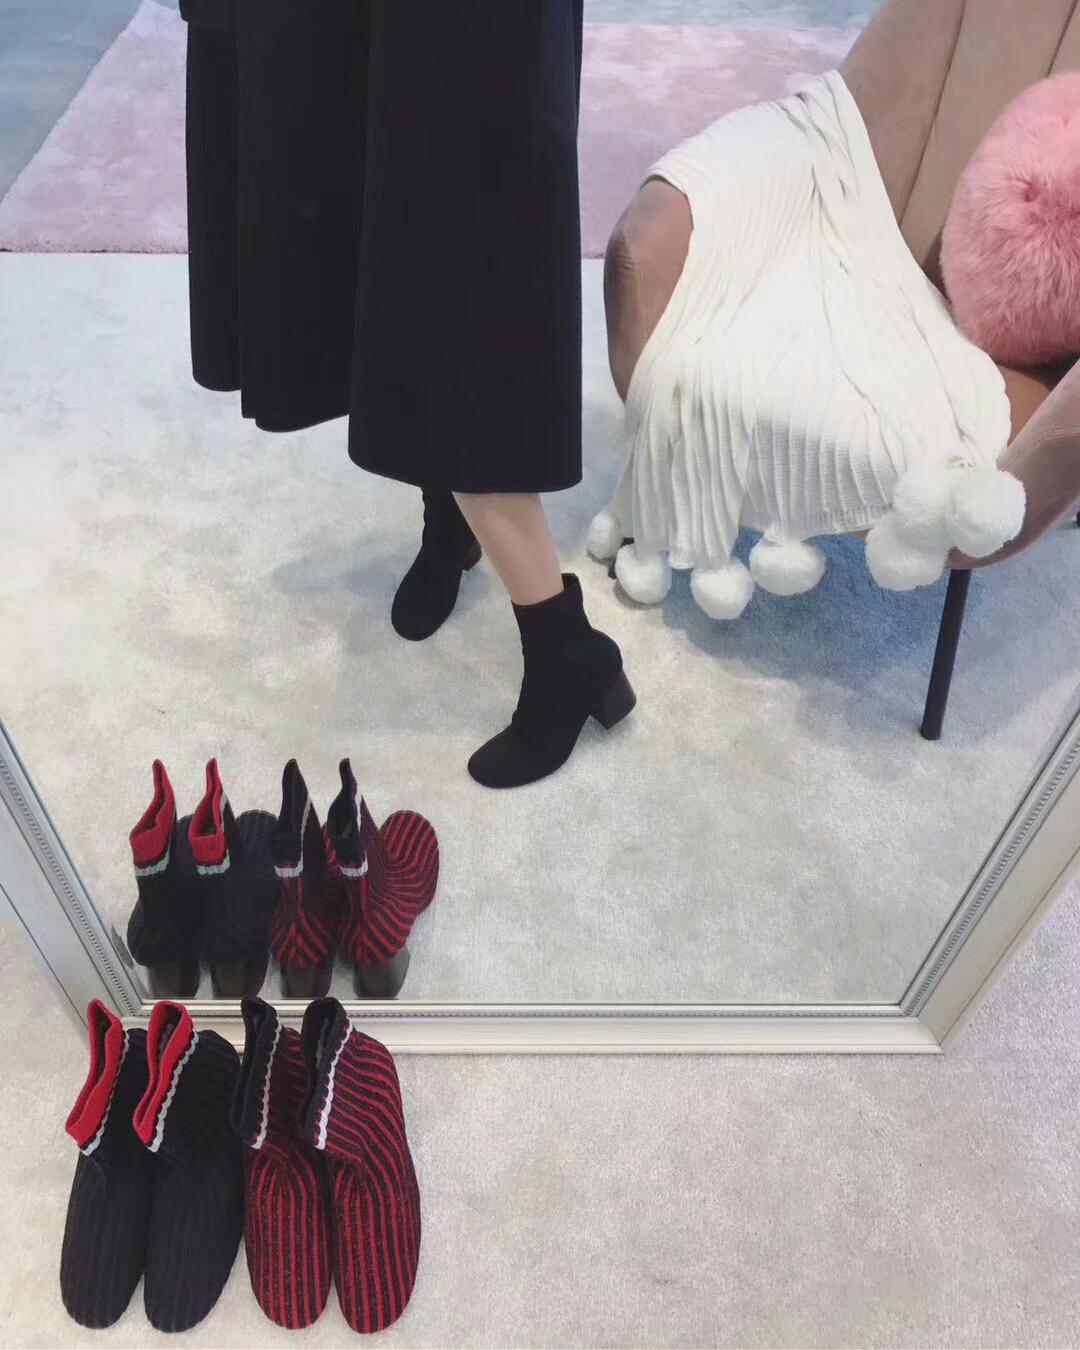 Celine 袜子鞋!超经典的一款百搭短靴